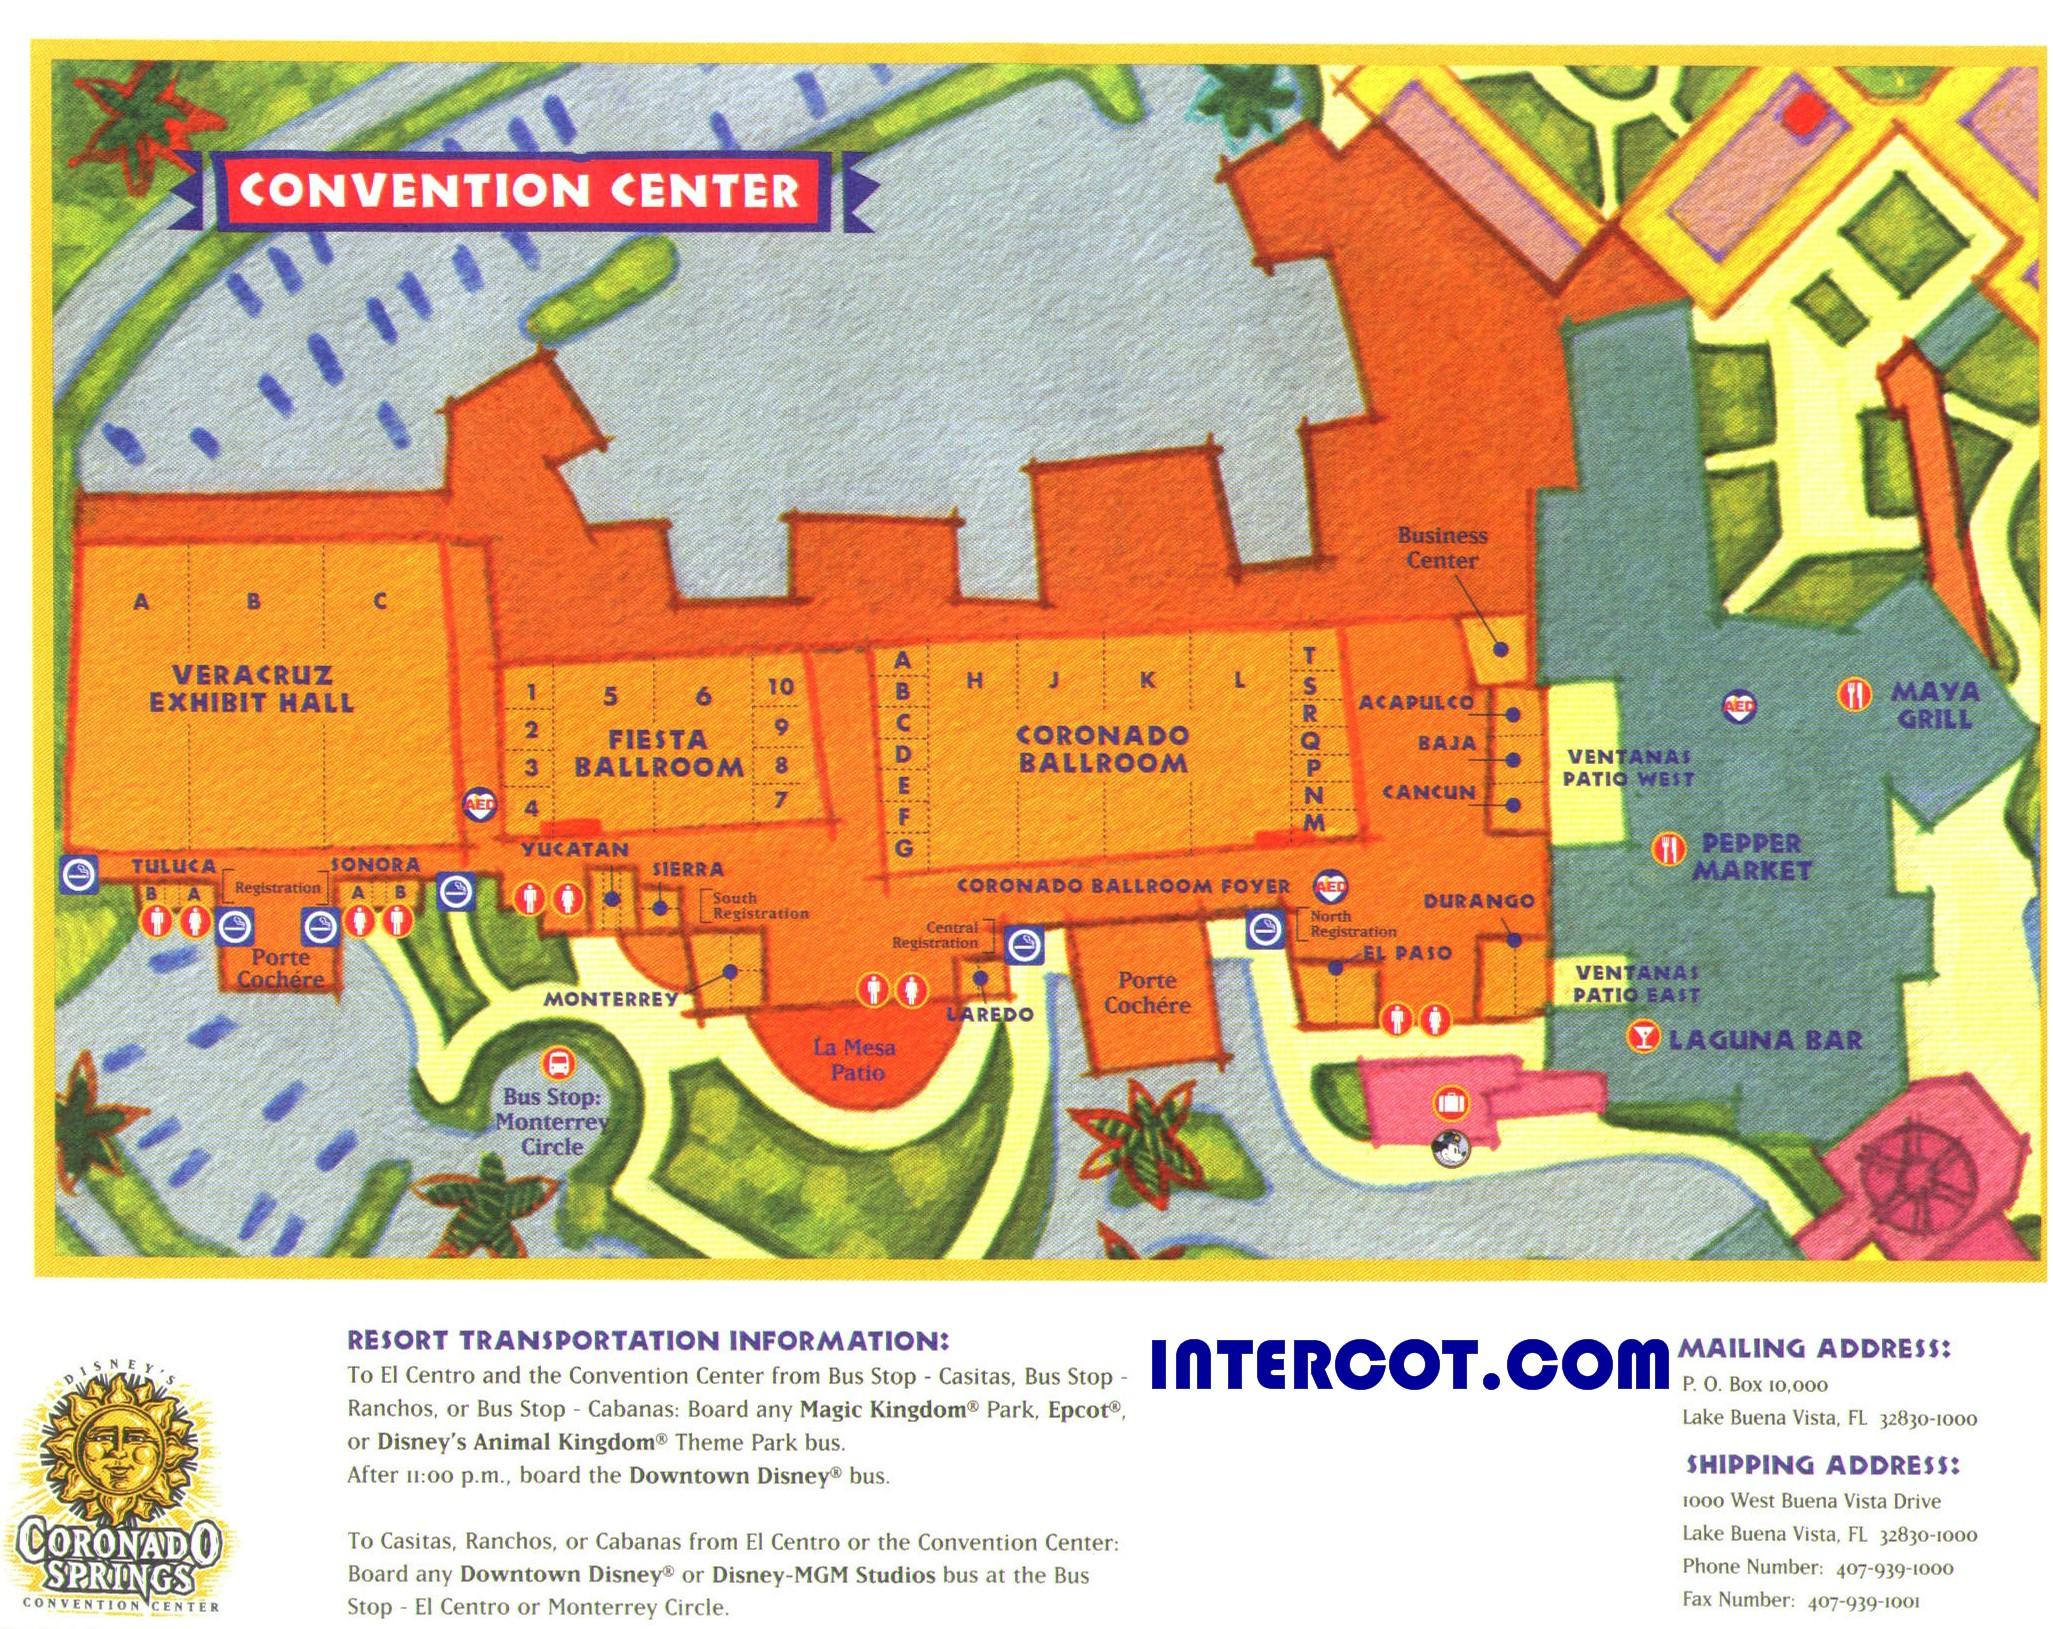 Walt Disney World Disney World Vacation Information